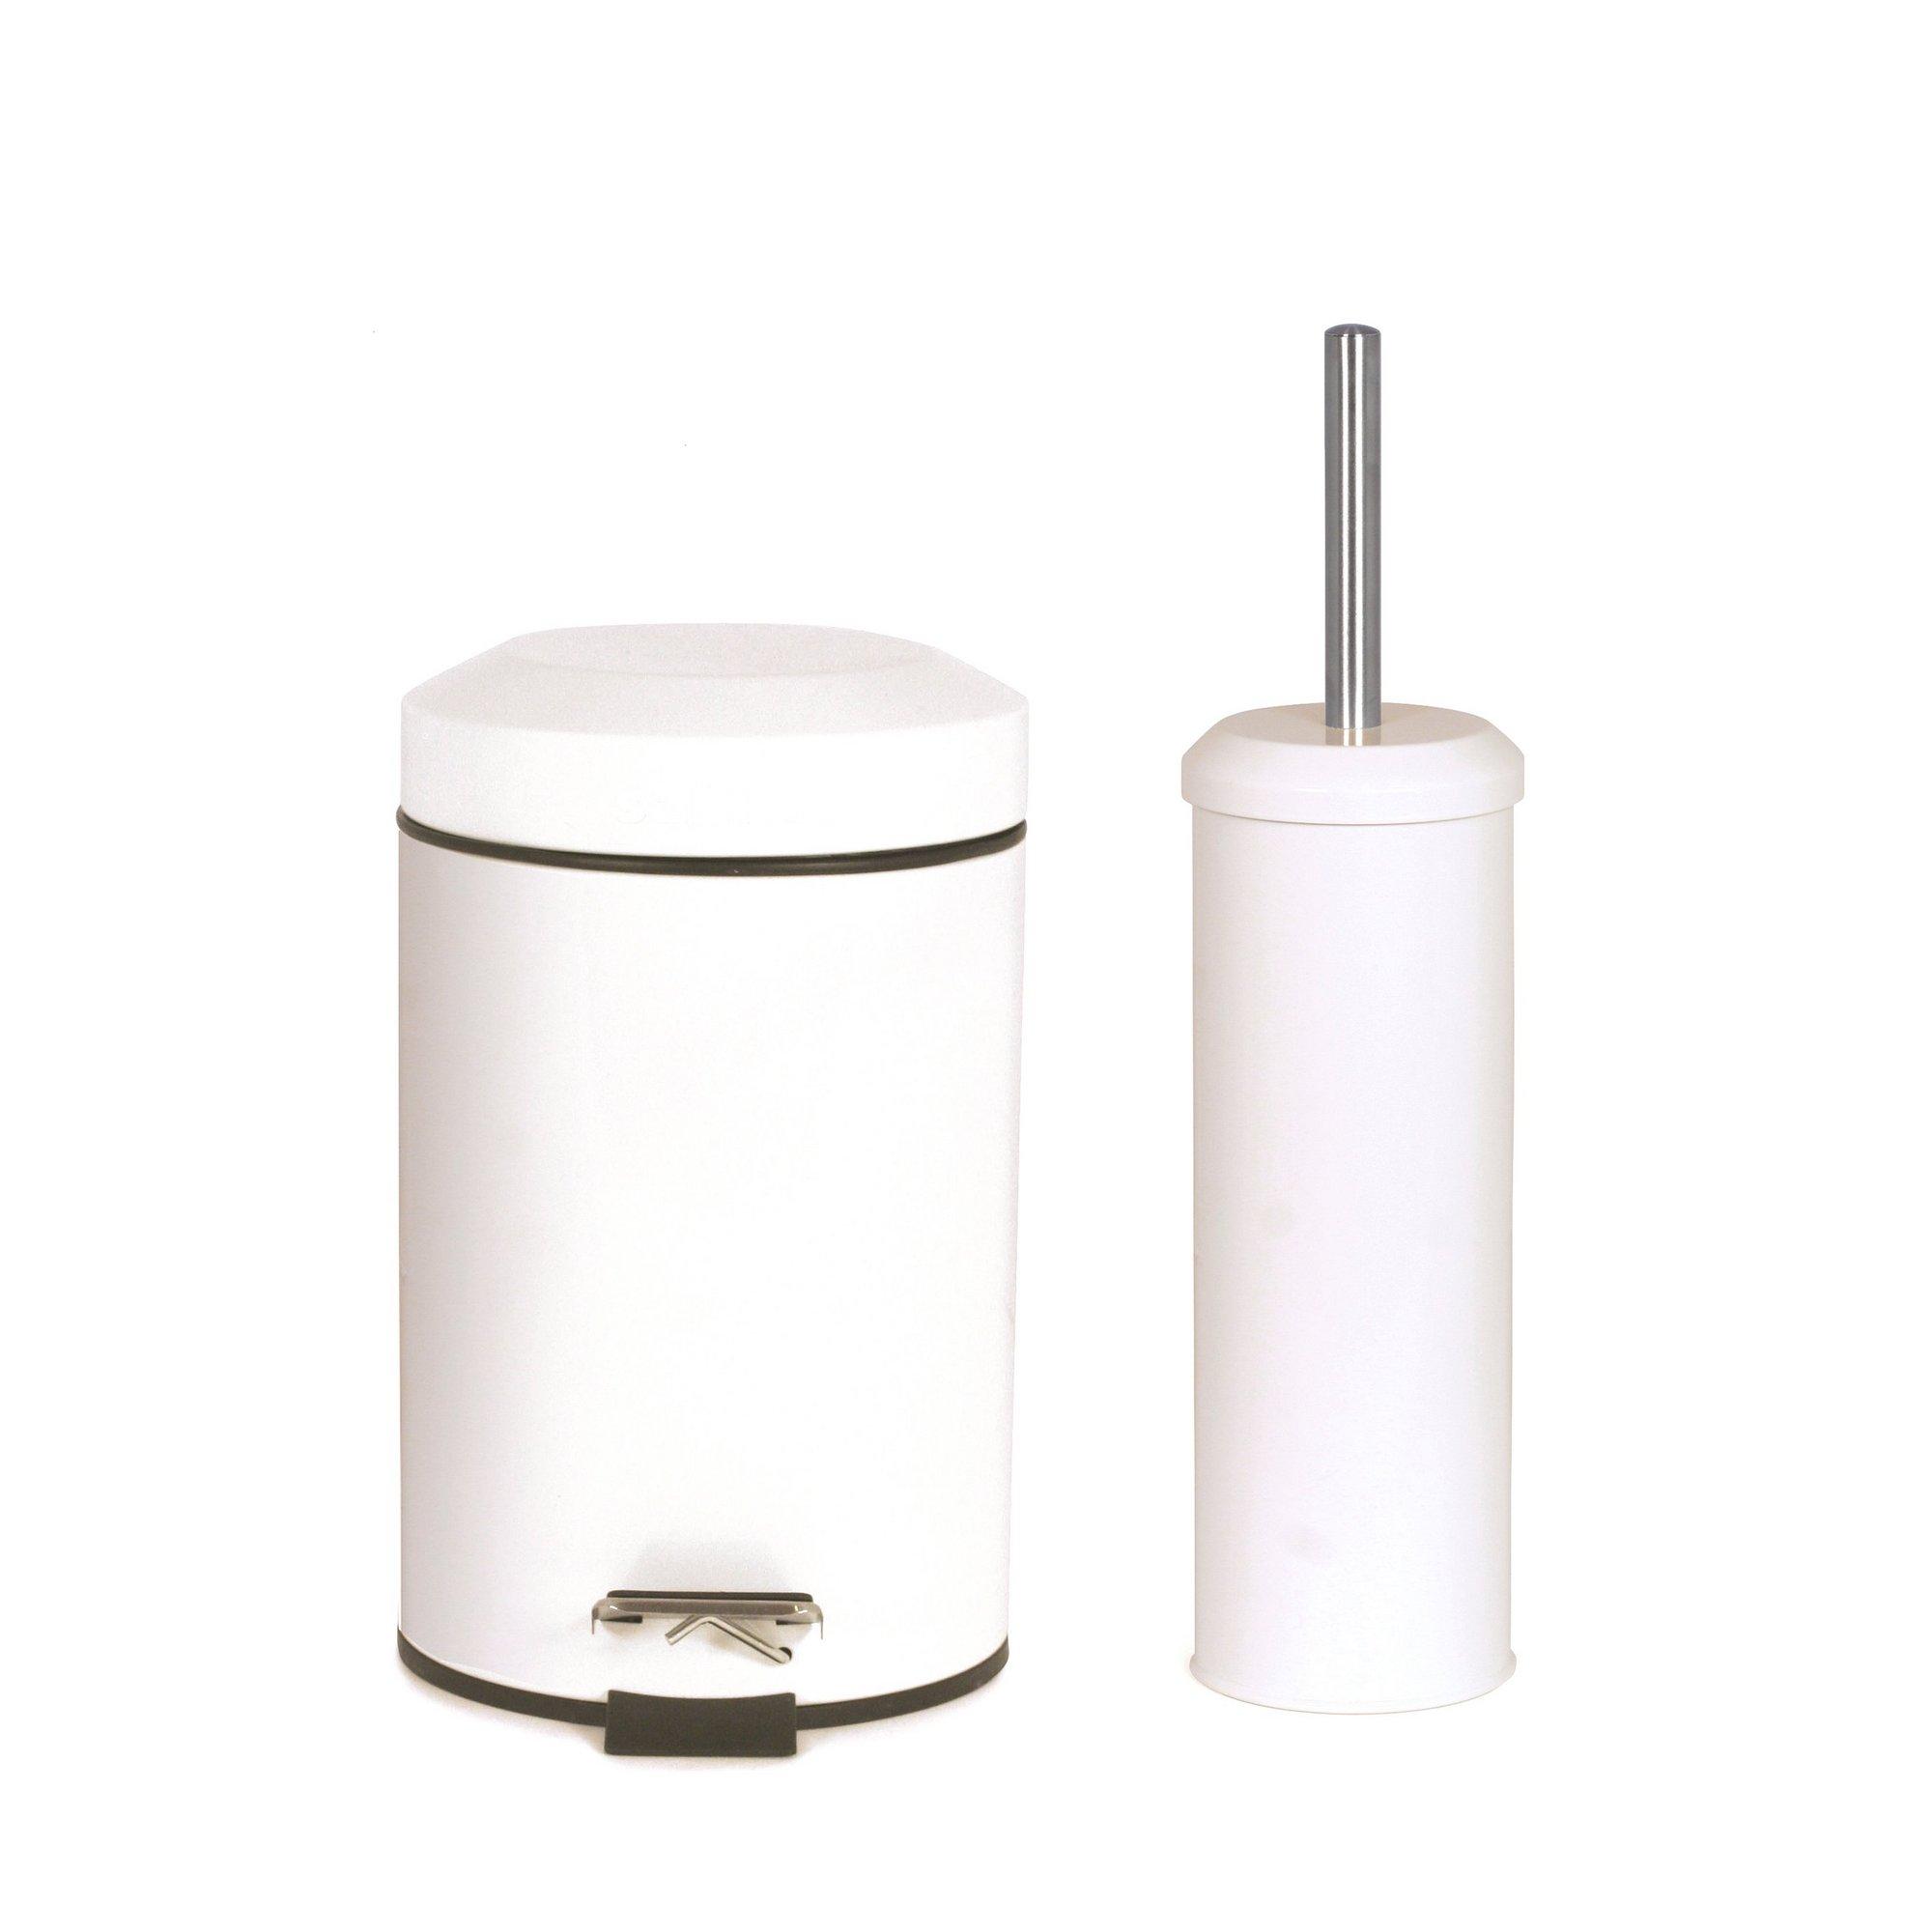 Image of Toilet Brush and Bin Set